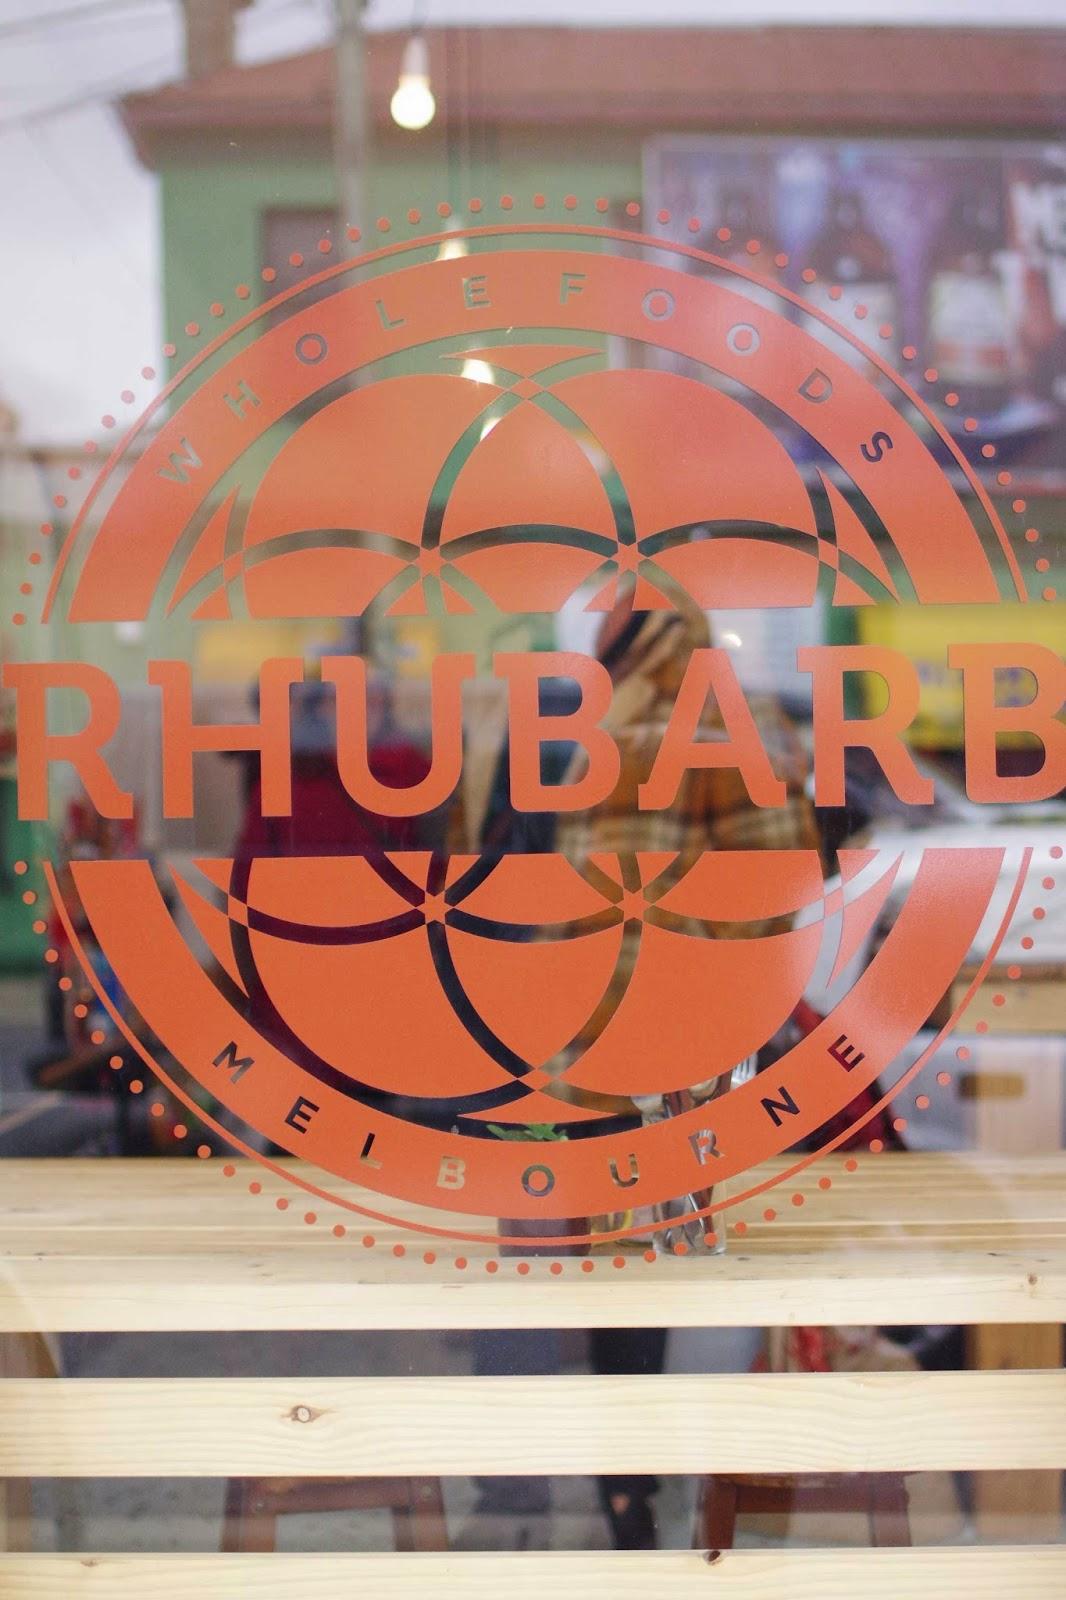 Rhubarb Wholefoods image